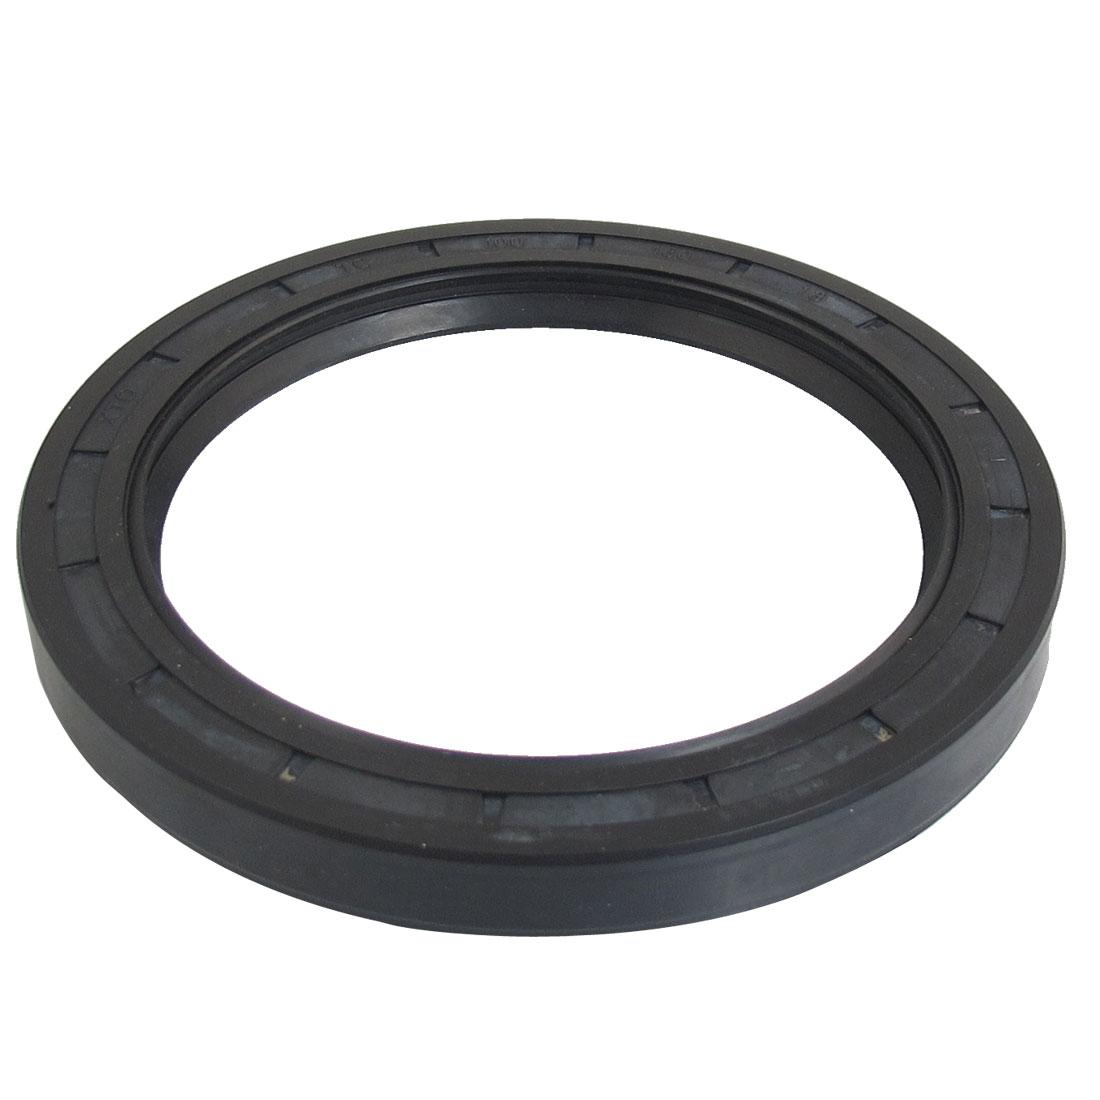 Black Nitrile Rubber Dual Lips Oil Shaft Seal TC 100mm x 130mm x 13mm